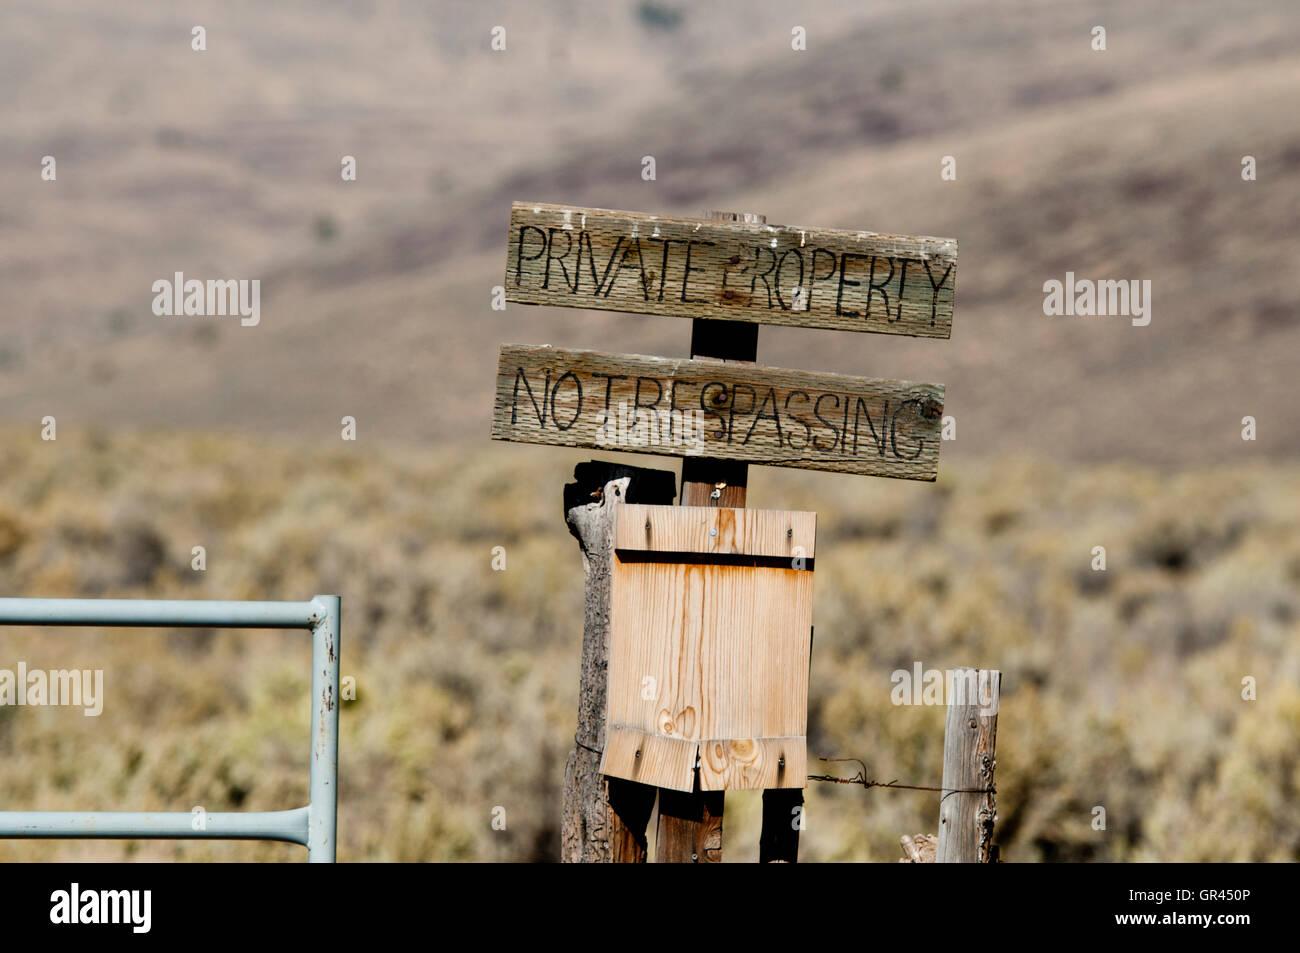 No trespassing sign blocking access to public land; Steens Mountain, Oregon - Stock Image